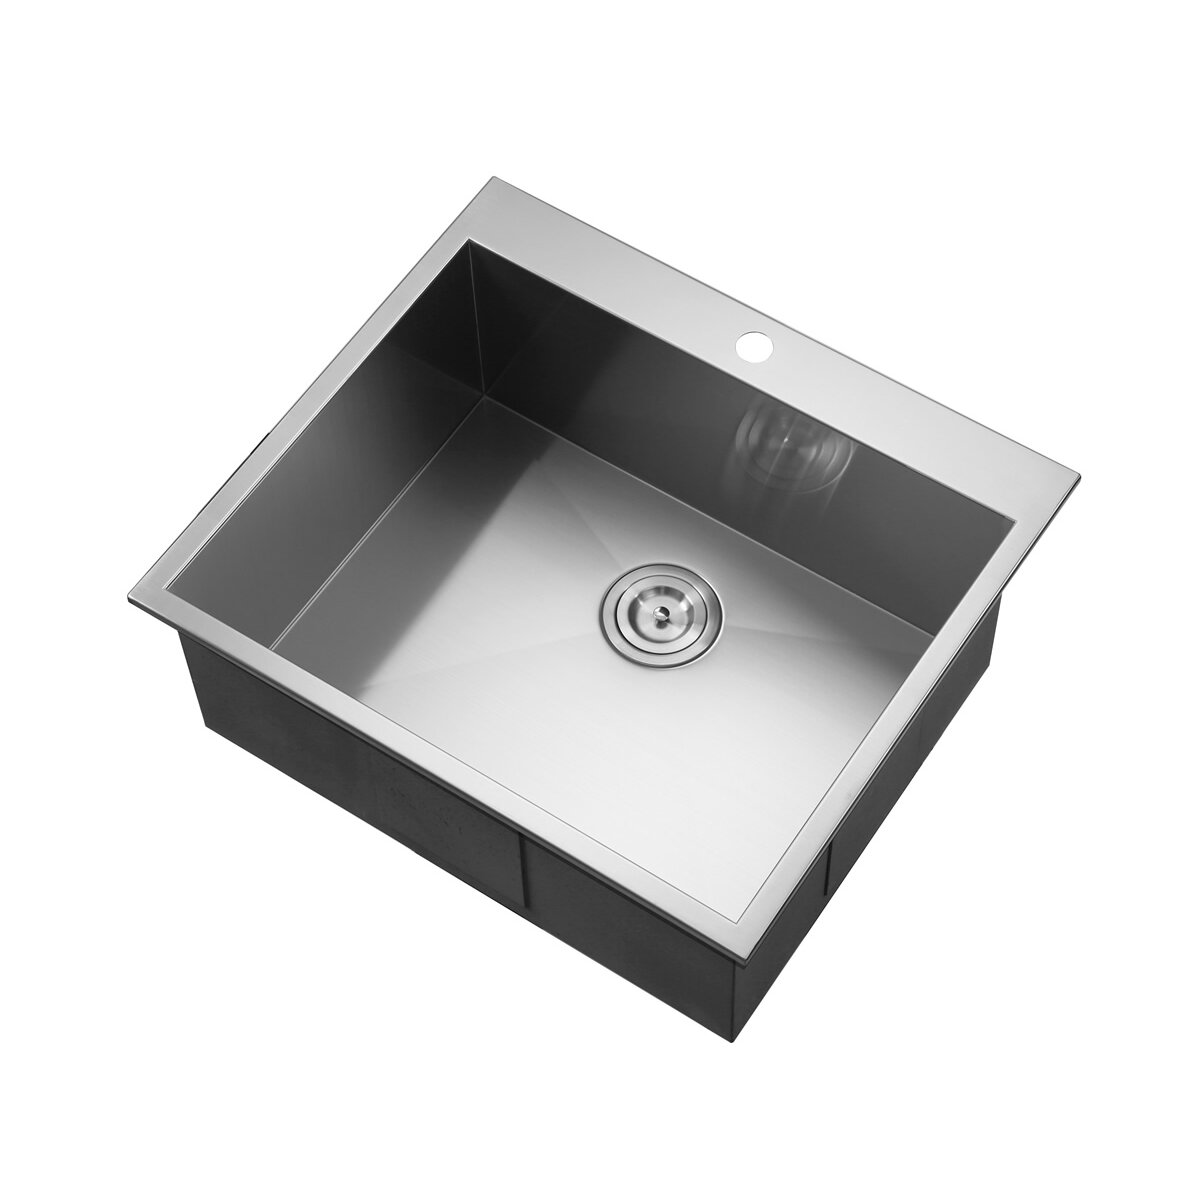 Square Overmount Kitchen Sink